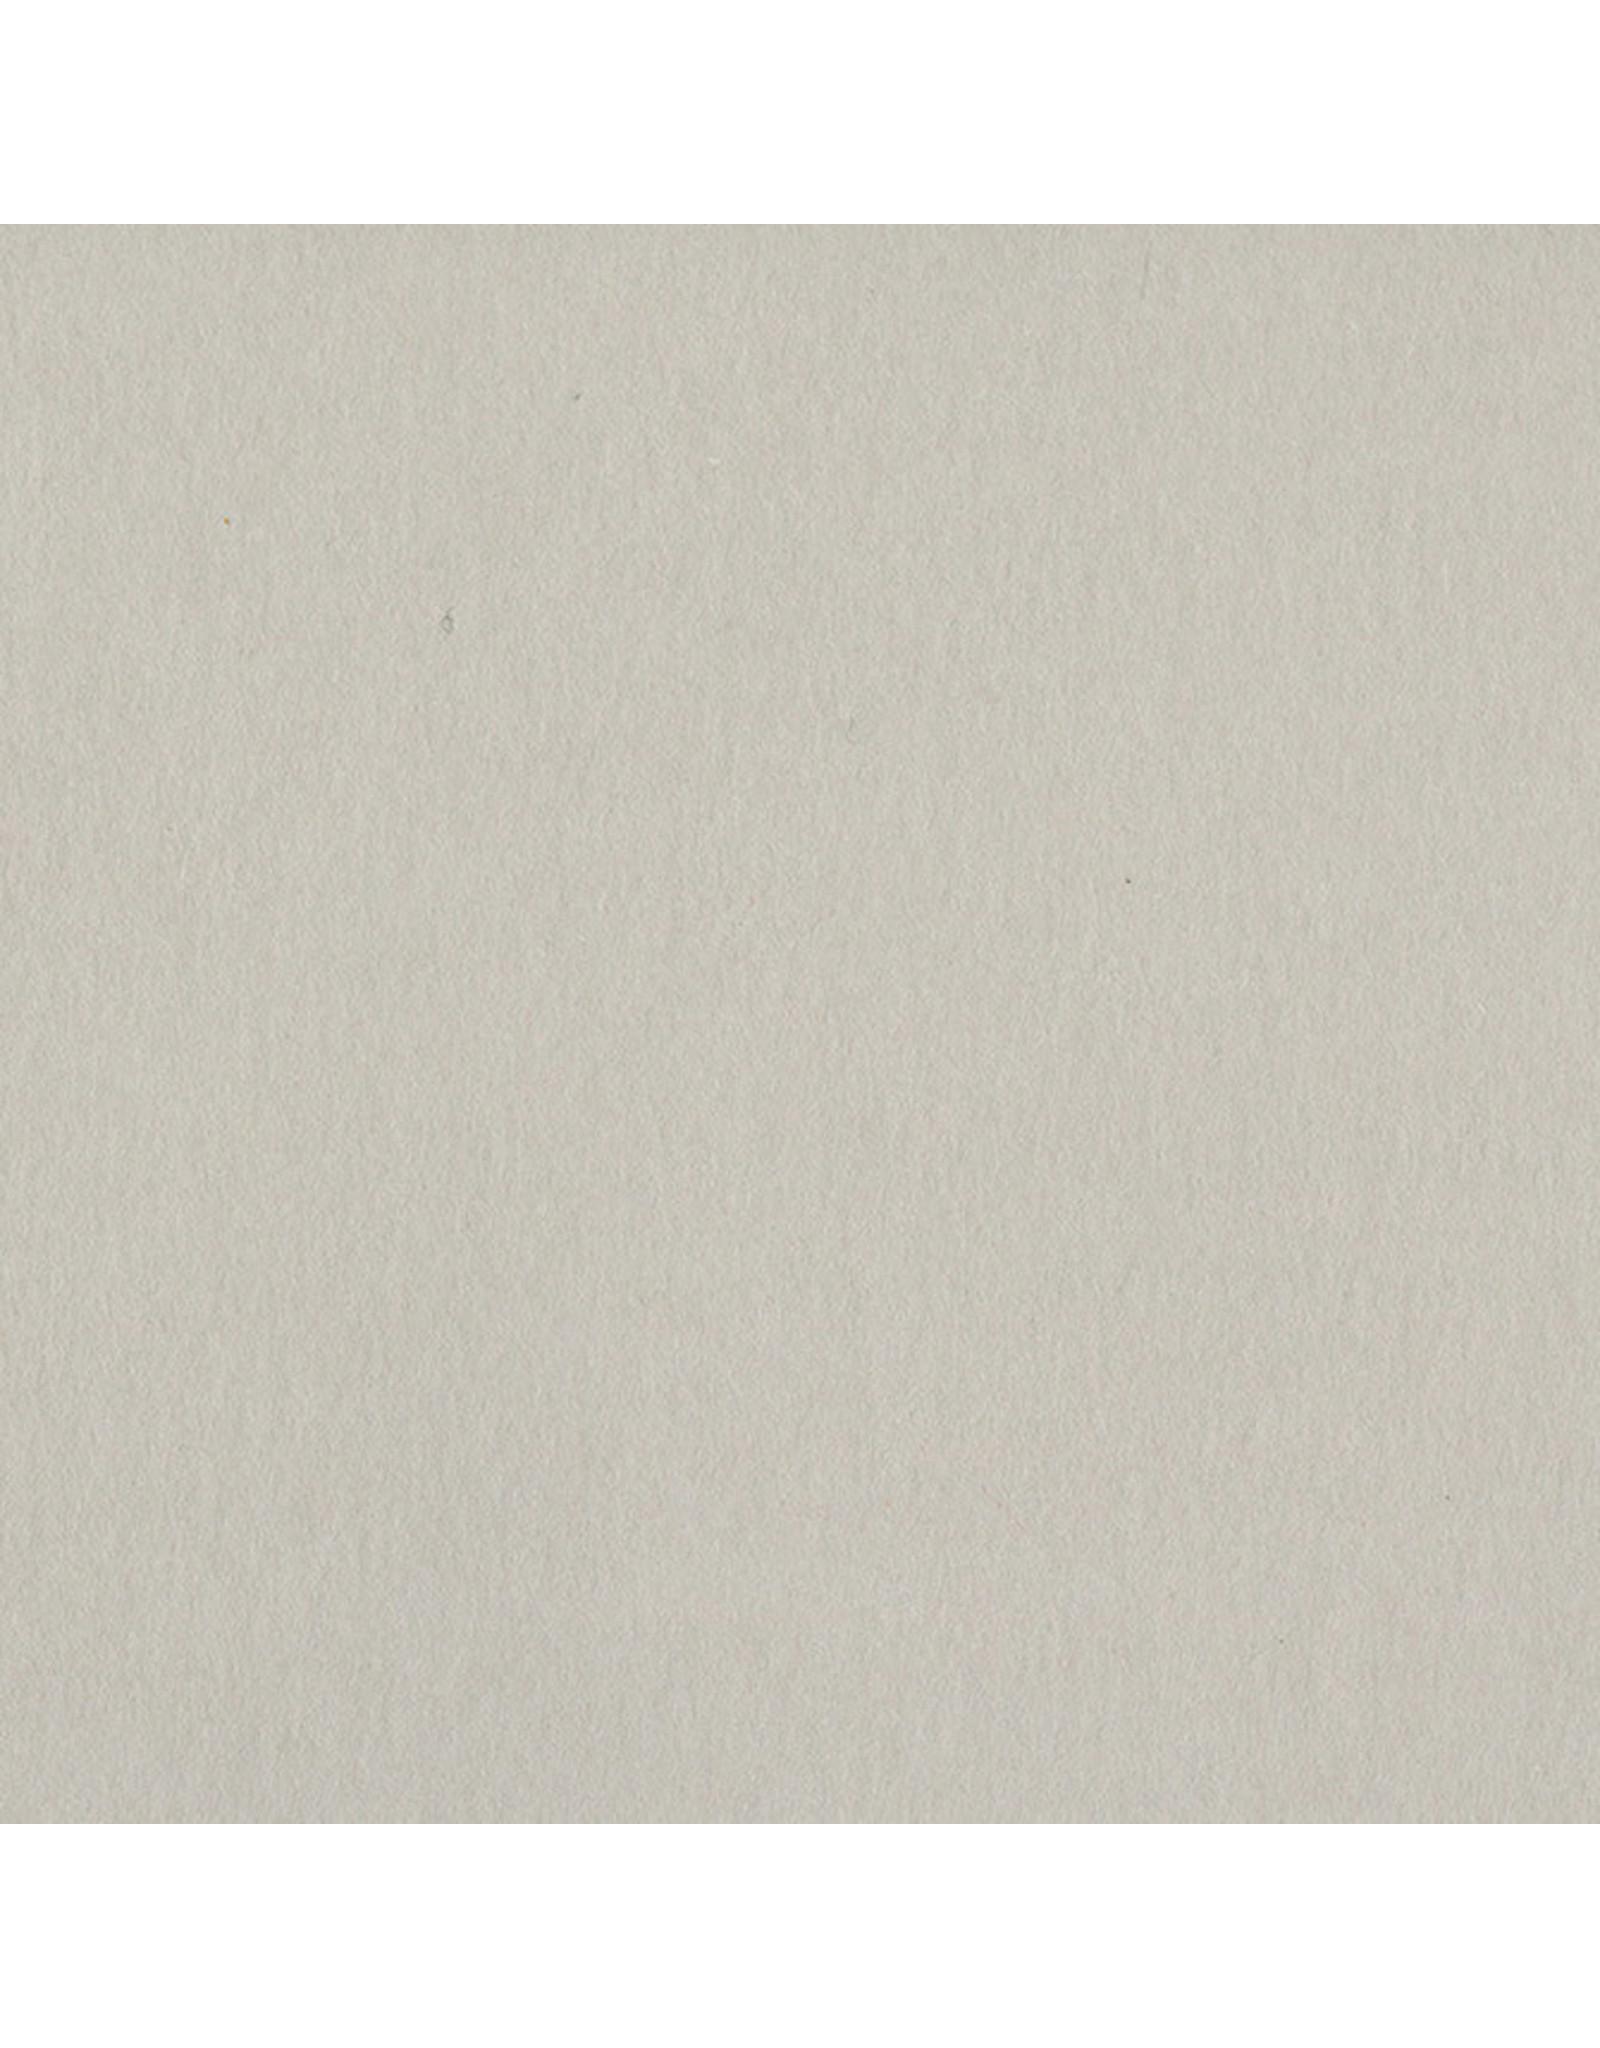 Bazzill Bazzill Card Shoppe 8.5x11 -  Alpaca